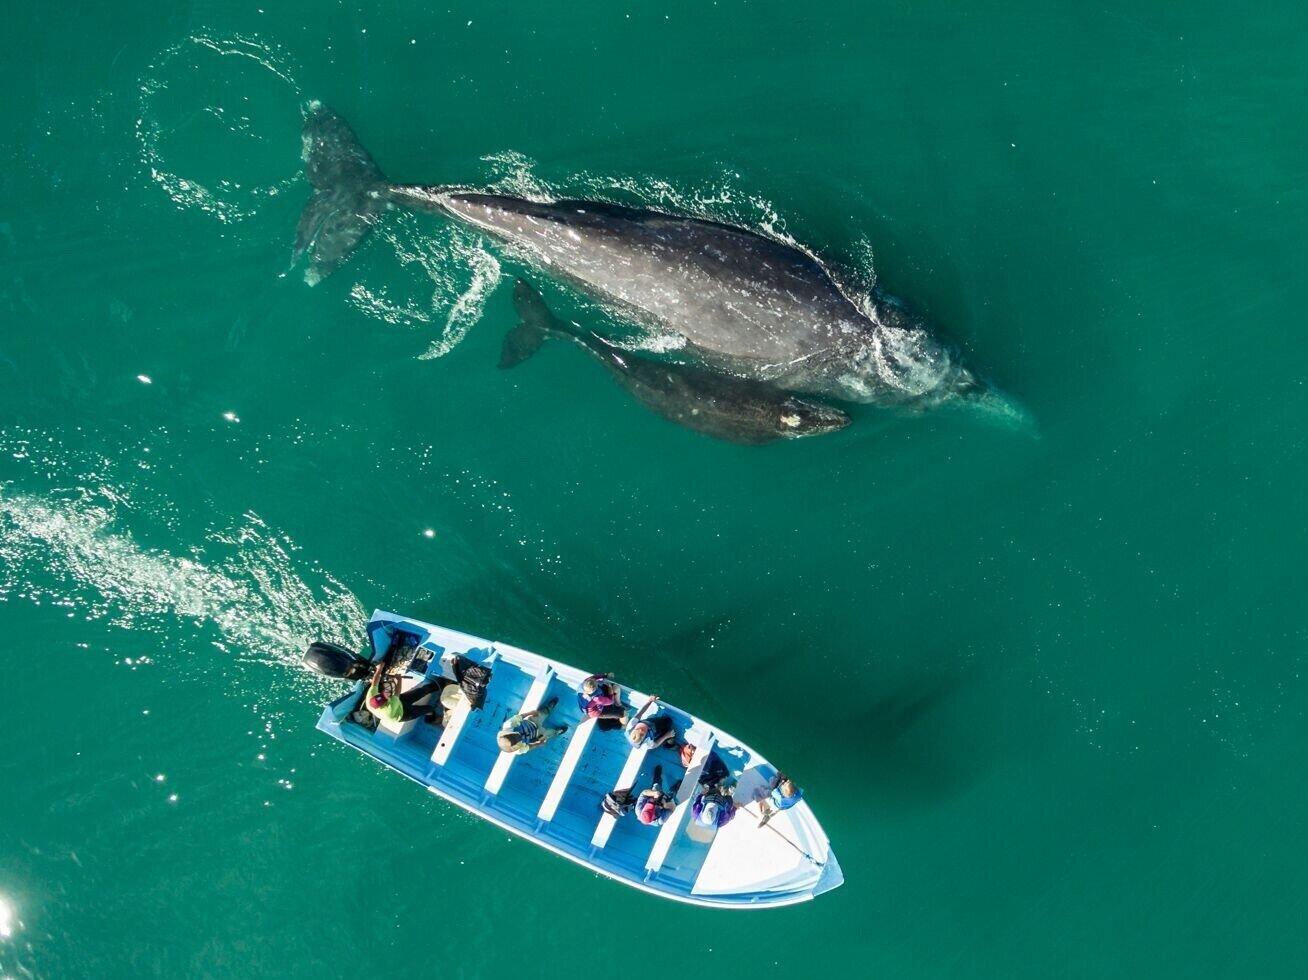 Women+in+Baja+beside+Whale+mom+and+baby.jpg